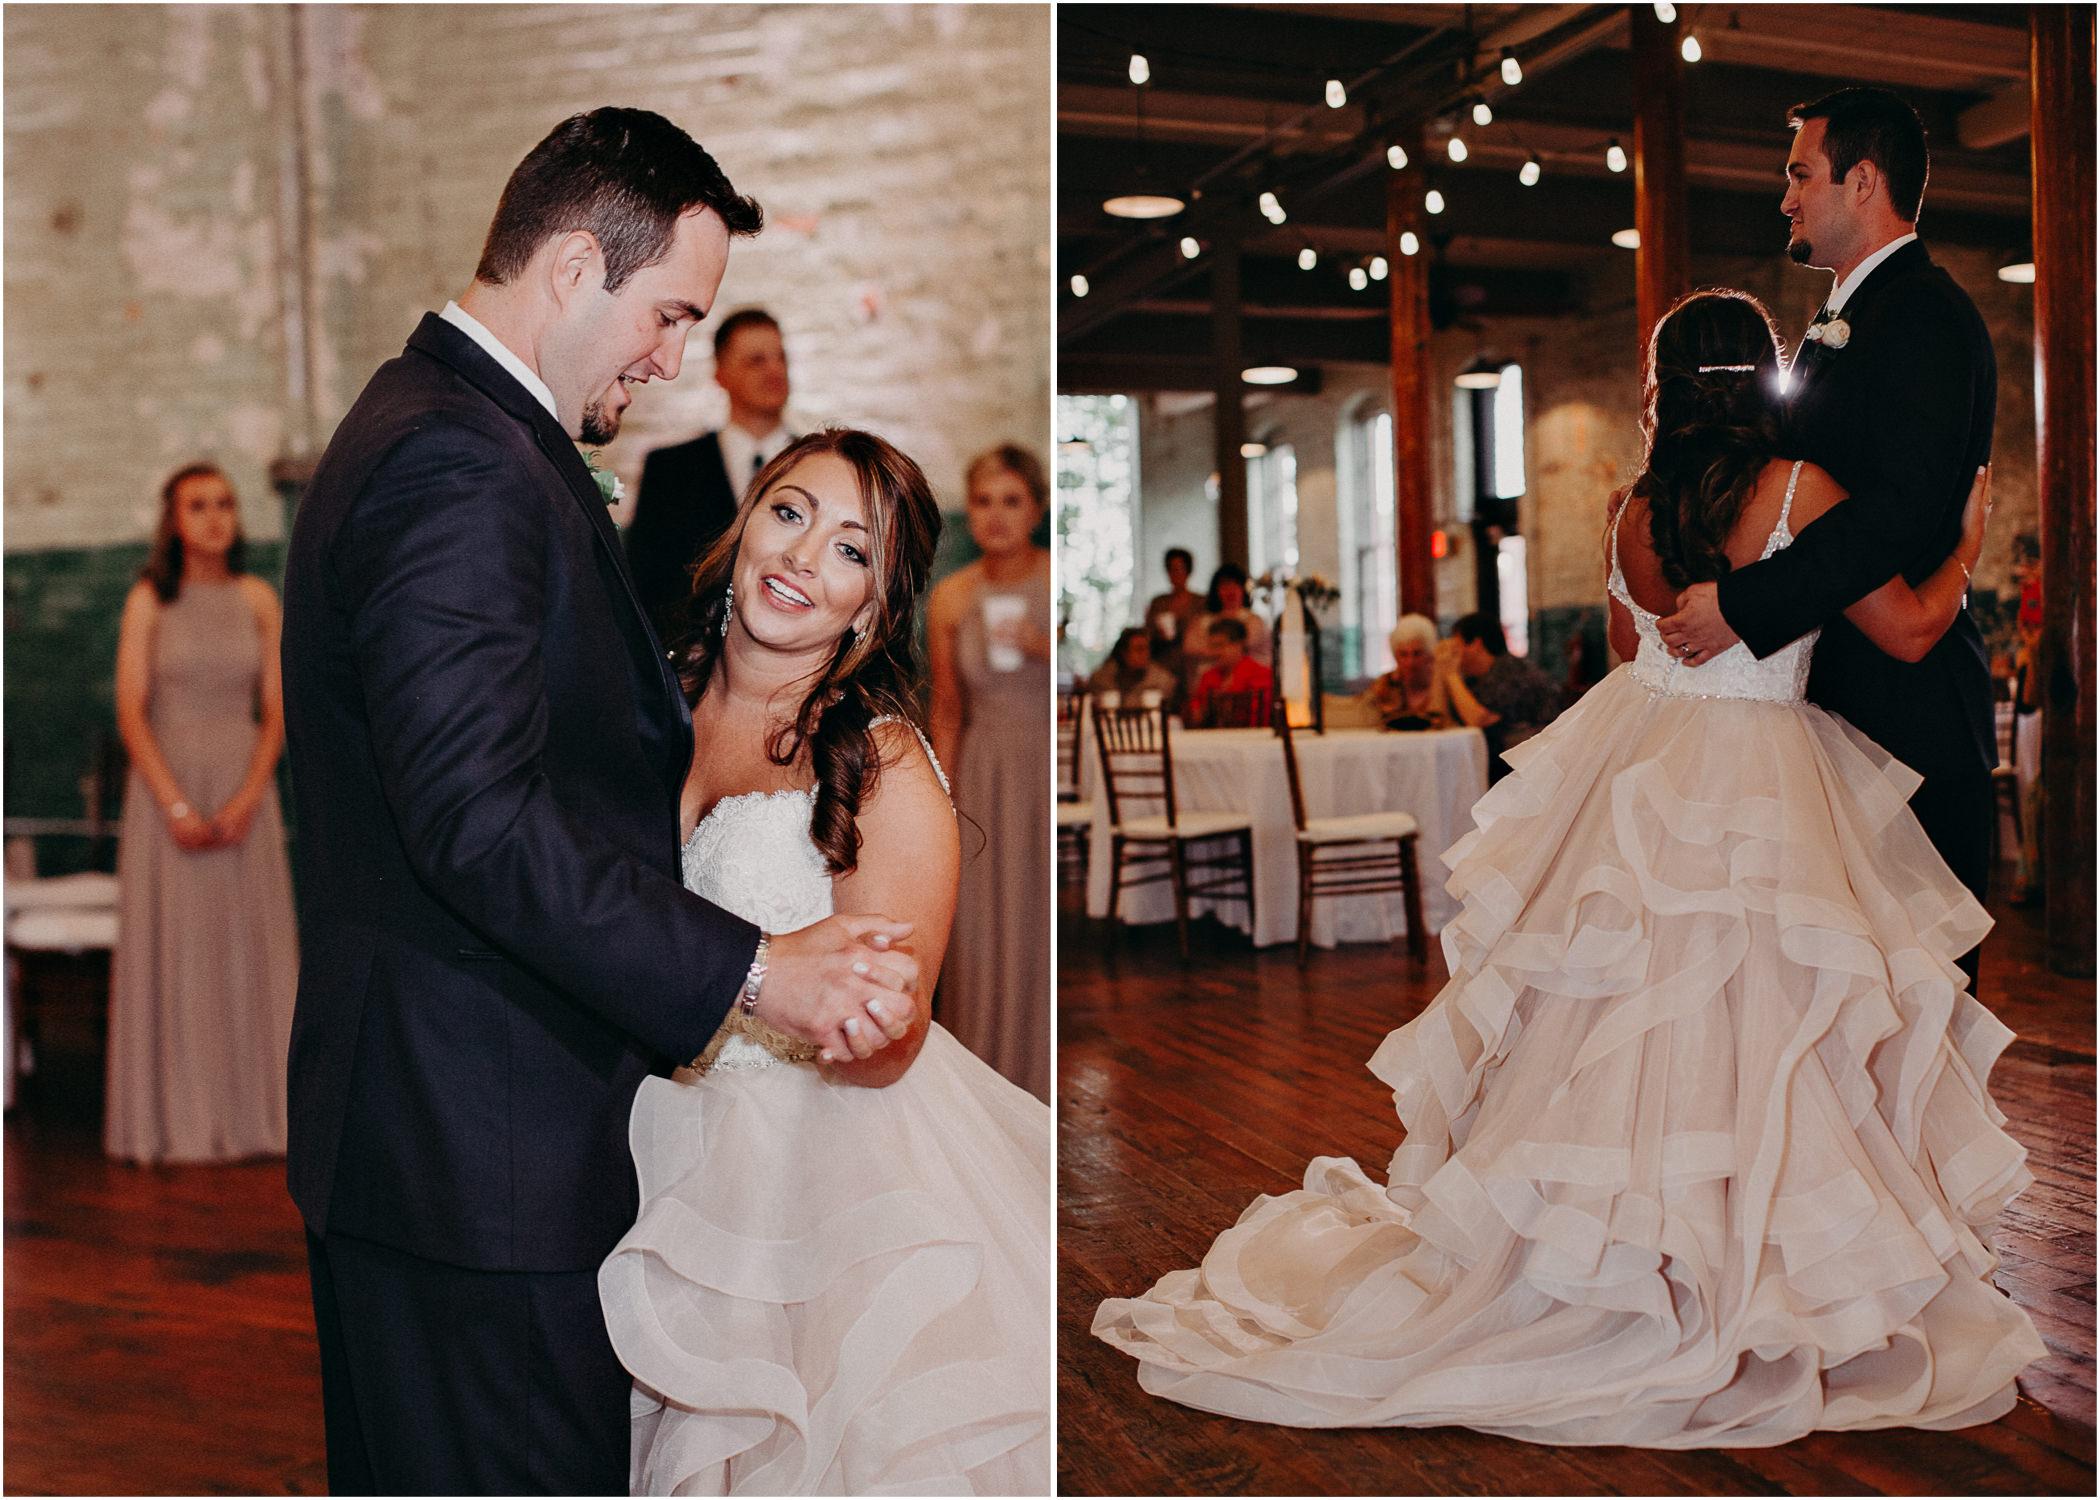 61 4 - Atlanta Wedding Photographer - The engine room - Ga - Wedding trends - Aline Marin Photography.jpg